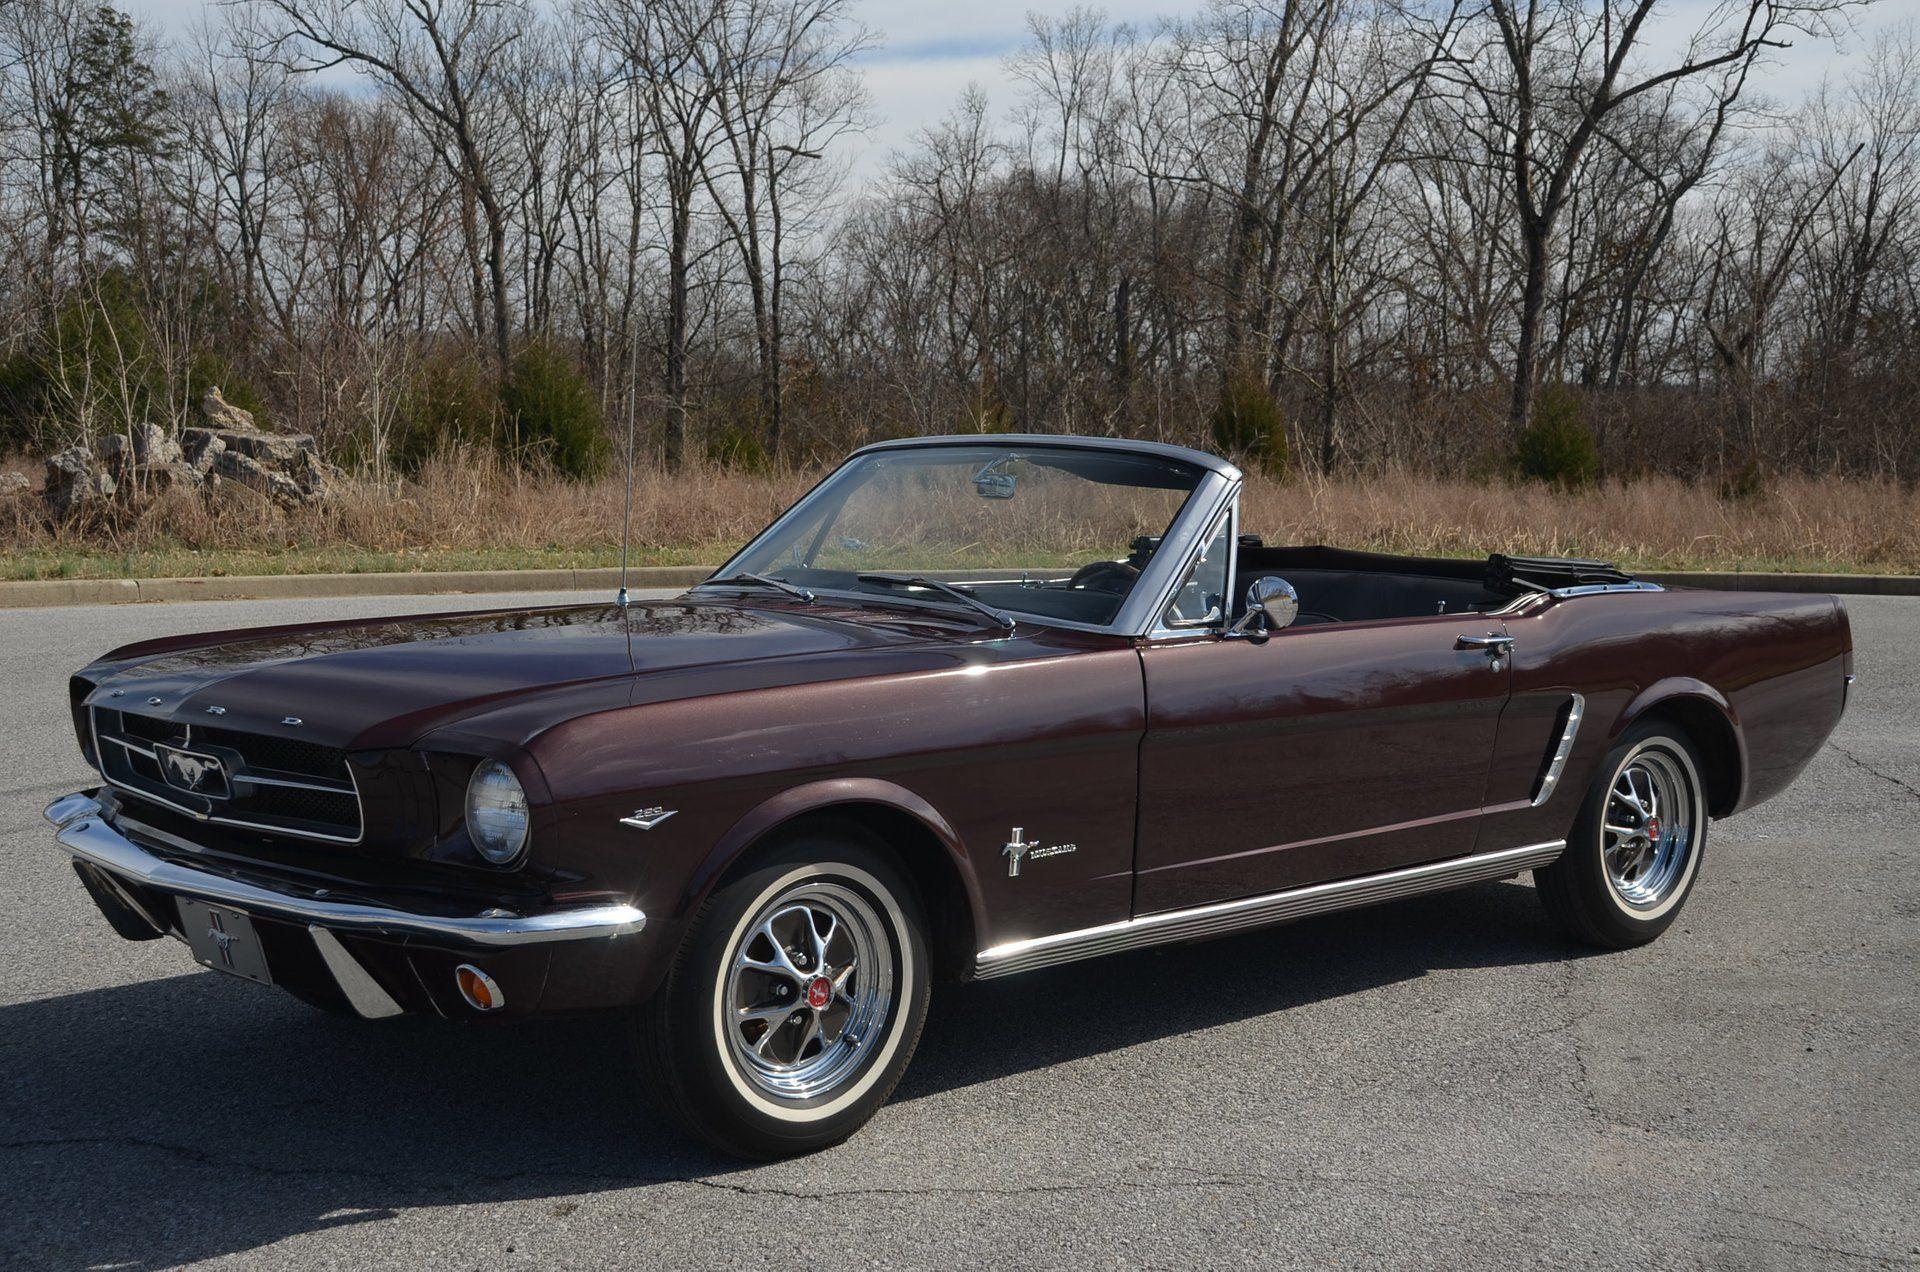 "<img src=""1965-ford-mustang.jpeg"" alt=""A stunning 1965 Ford Mustang convertible"">"